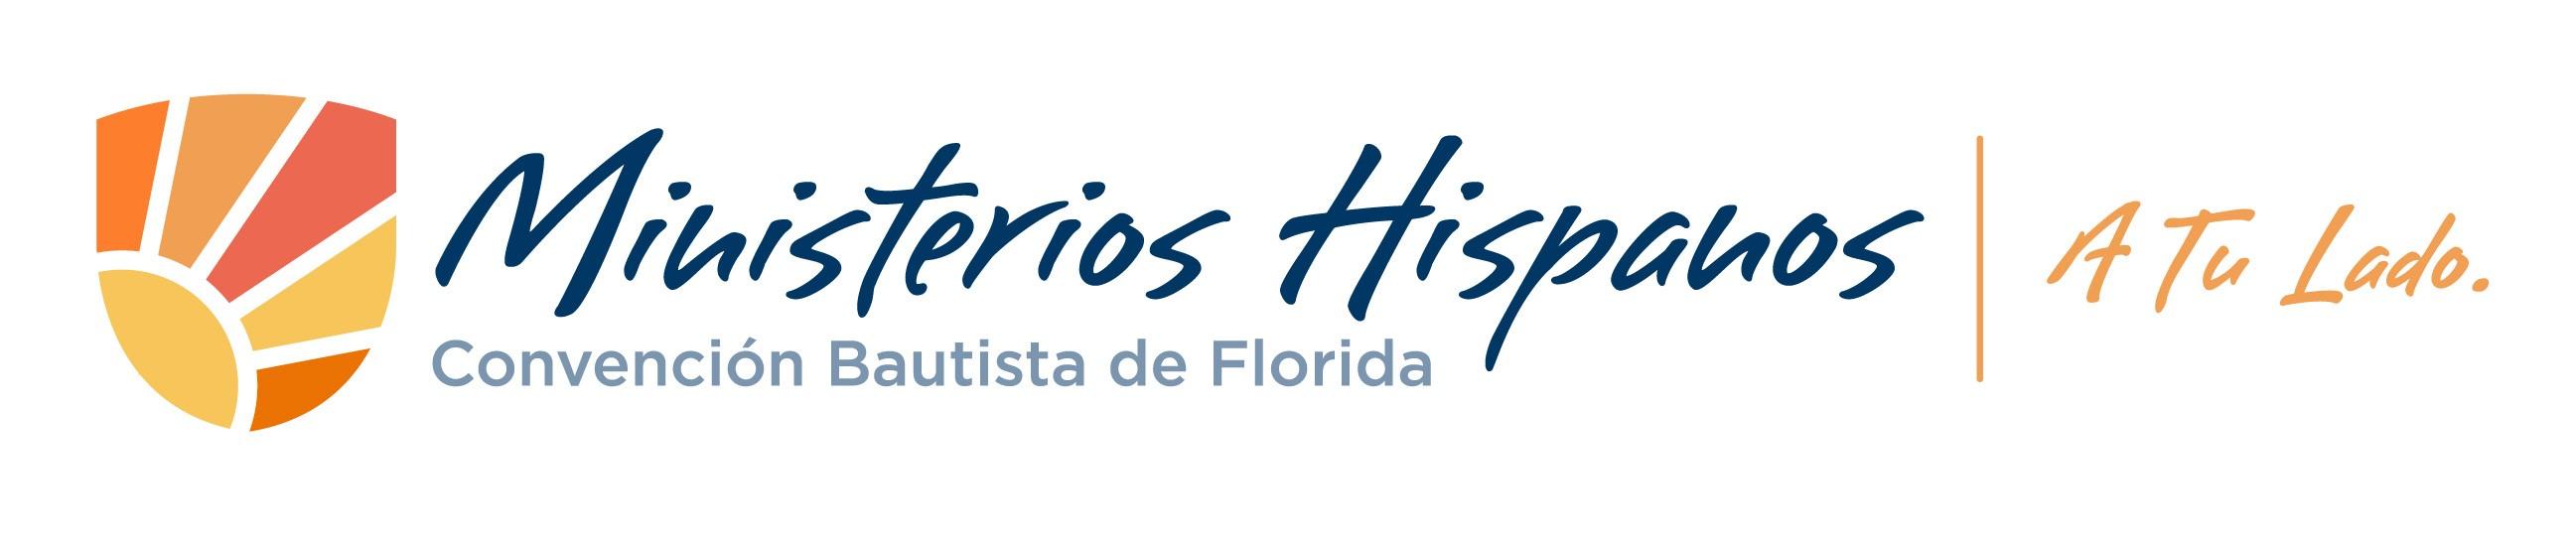 Florida Baptist Convention, Ministeres Hispanos